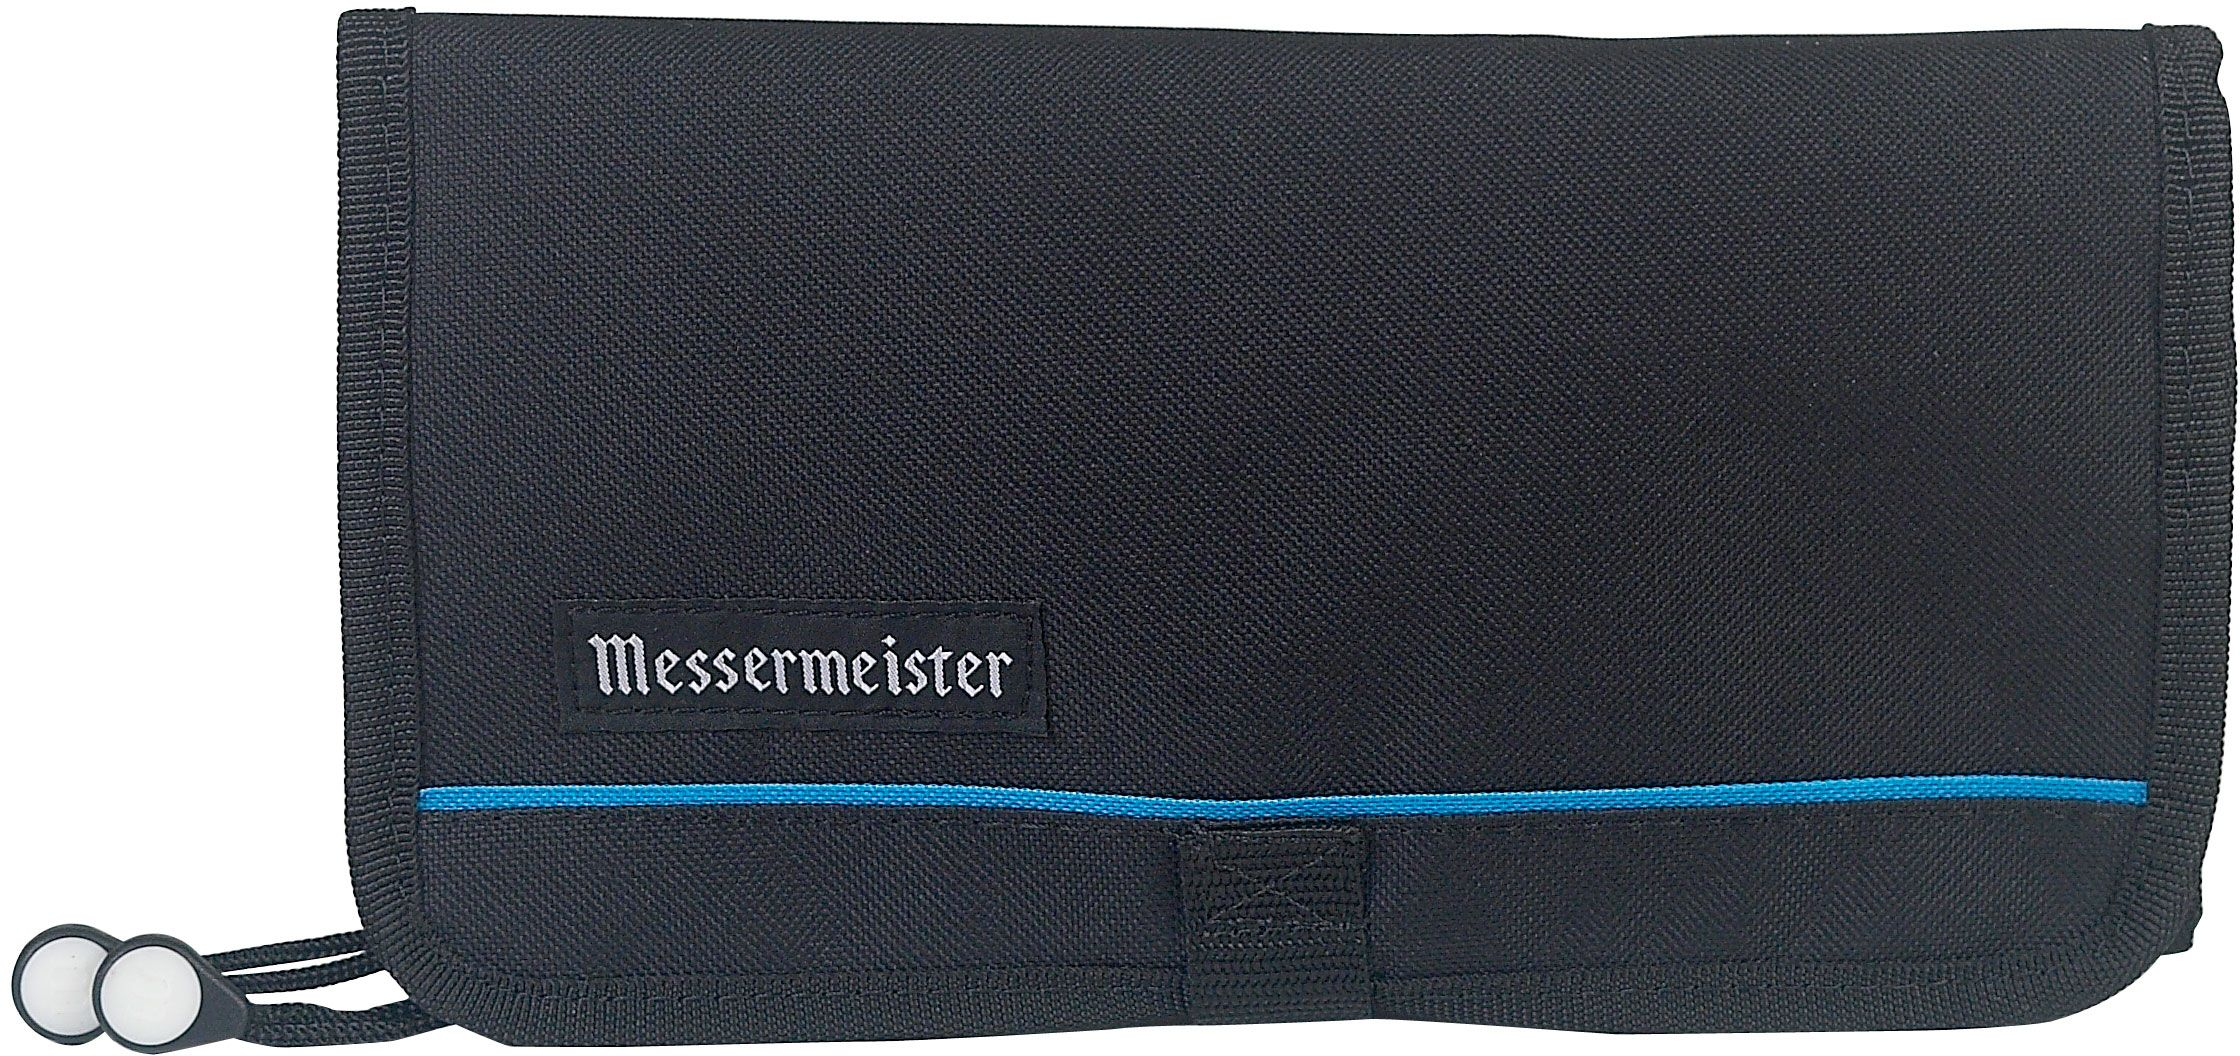 Messermeister 10 Pocket Black Padded Gadget Roll, Black (2066-E/SOFT)